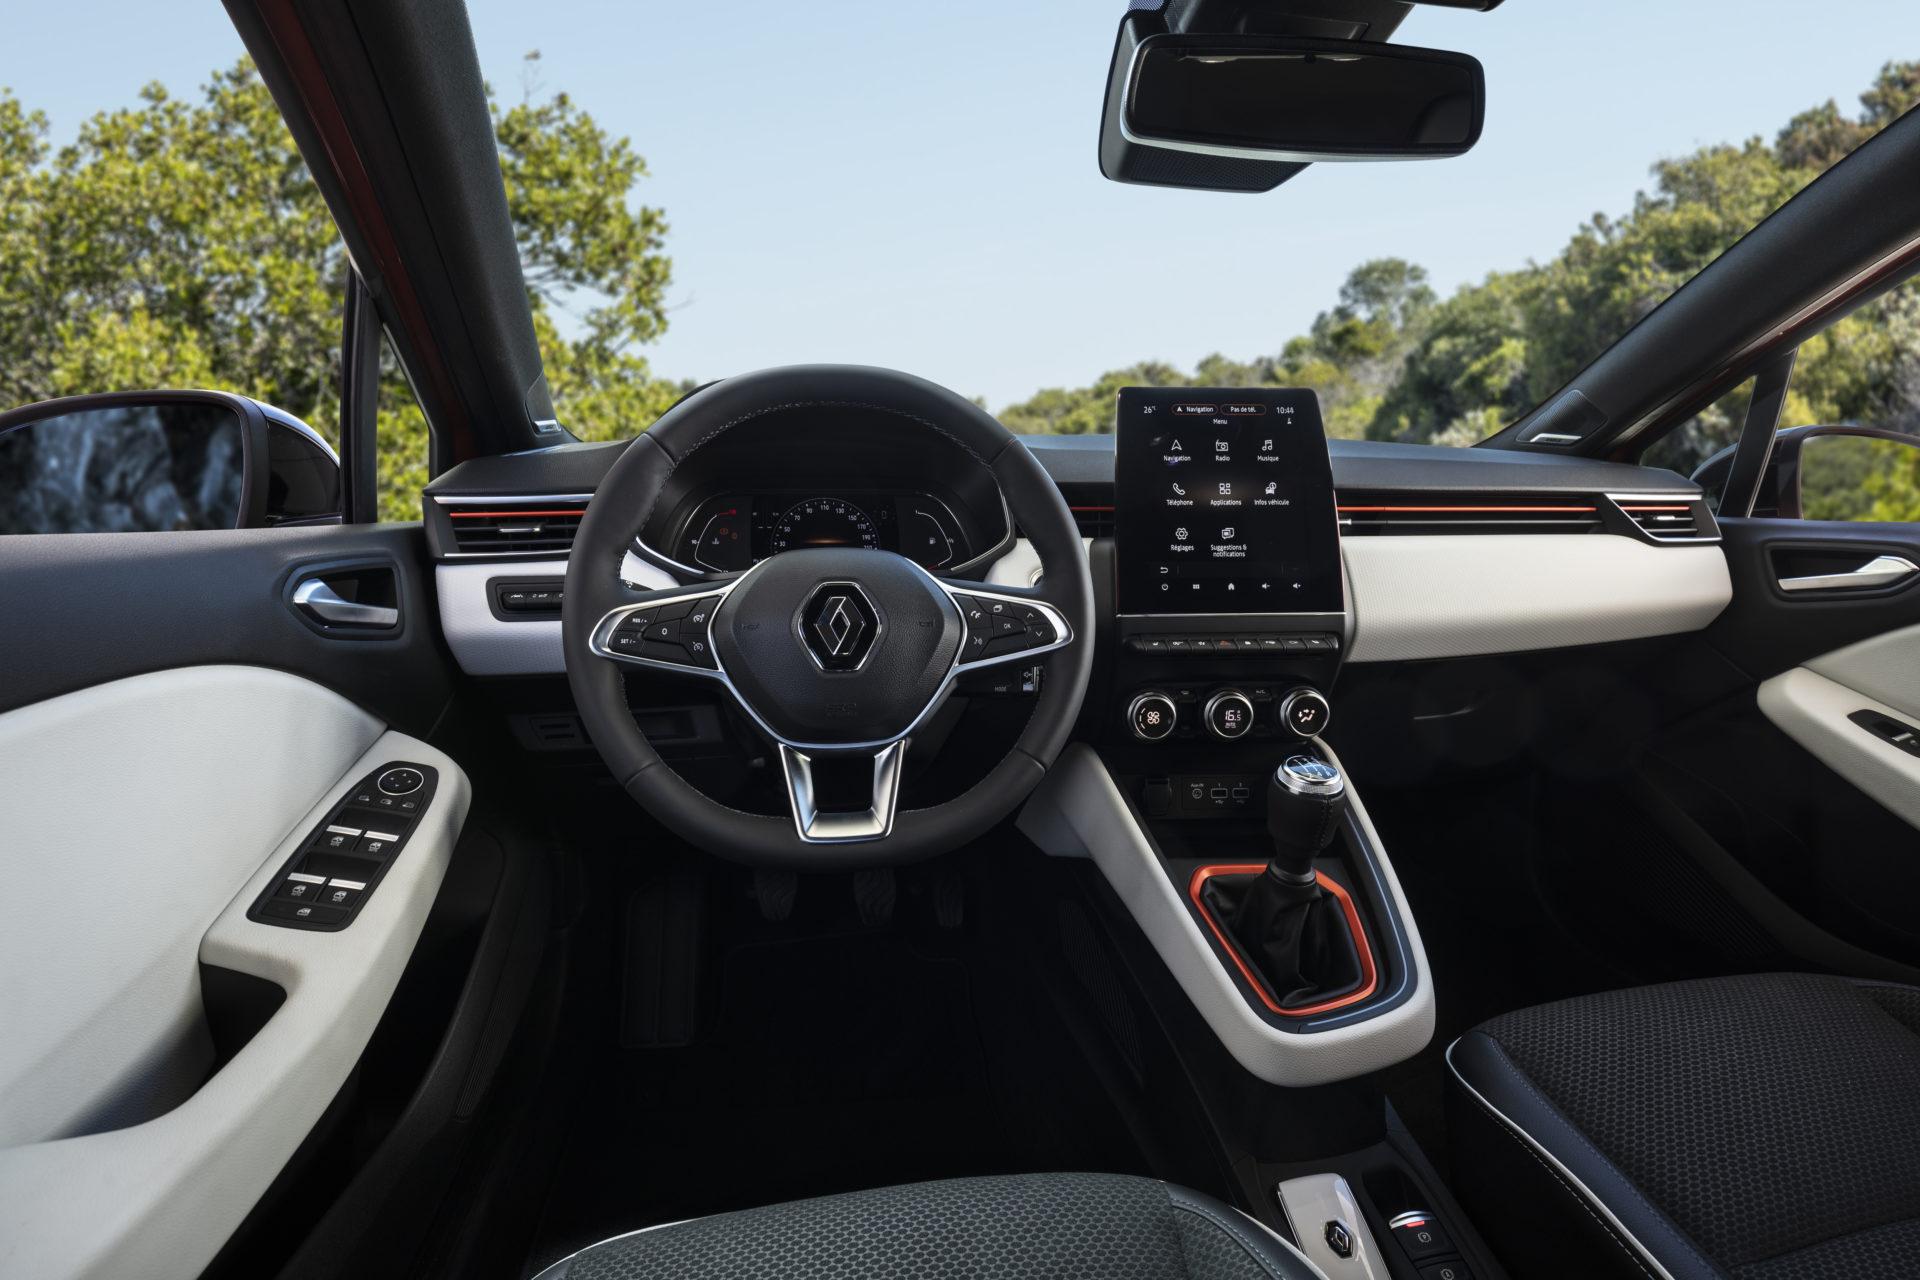 Nuova Clio Renault